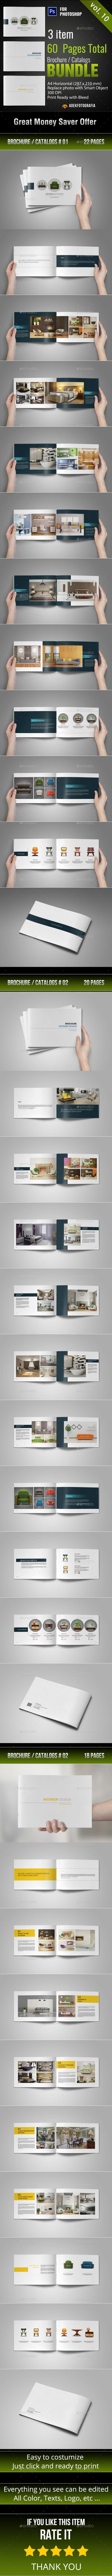 Multipurpose Catalogs / Brochure Bundle Vol. 10 - Catalogs Brochures